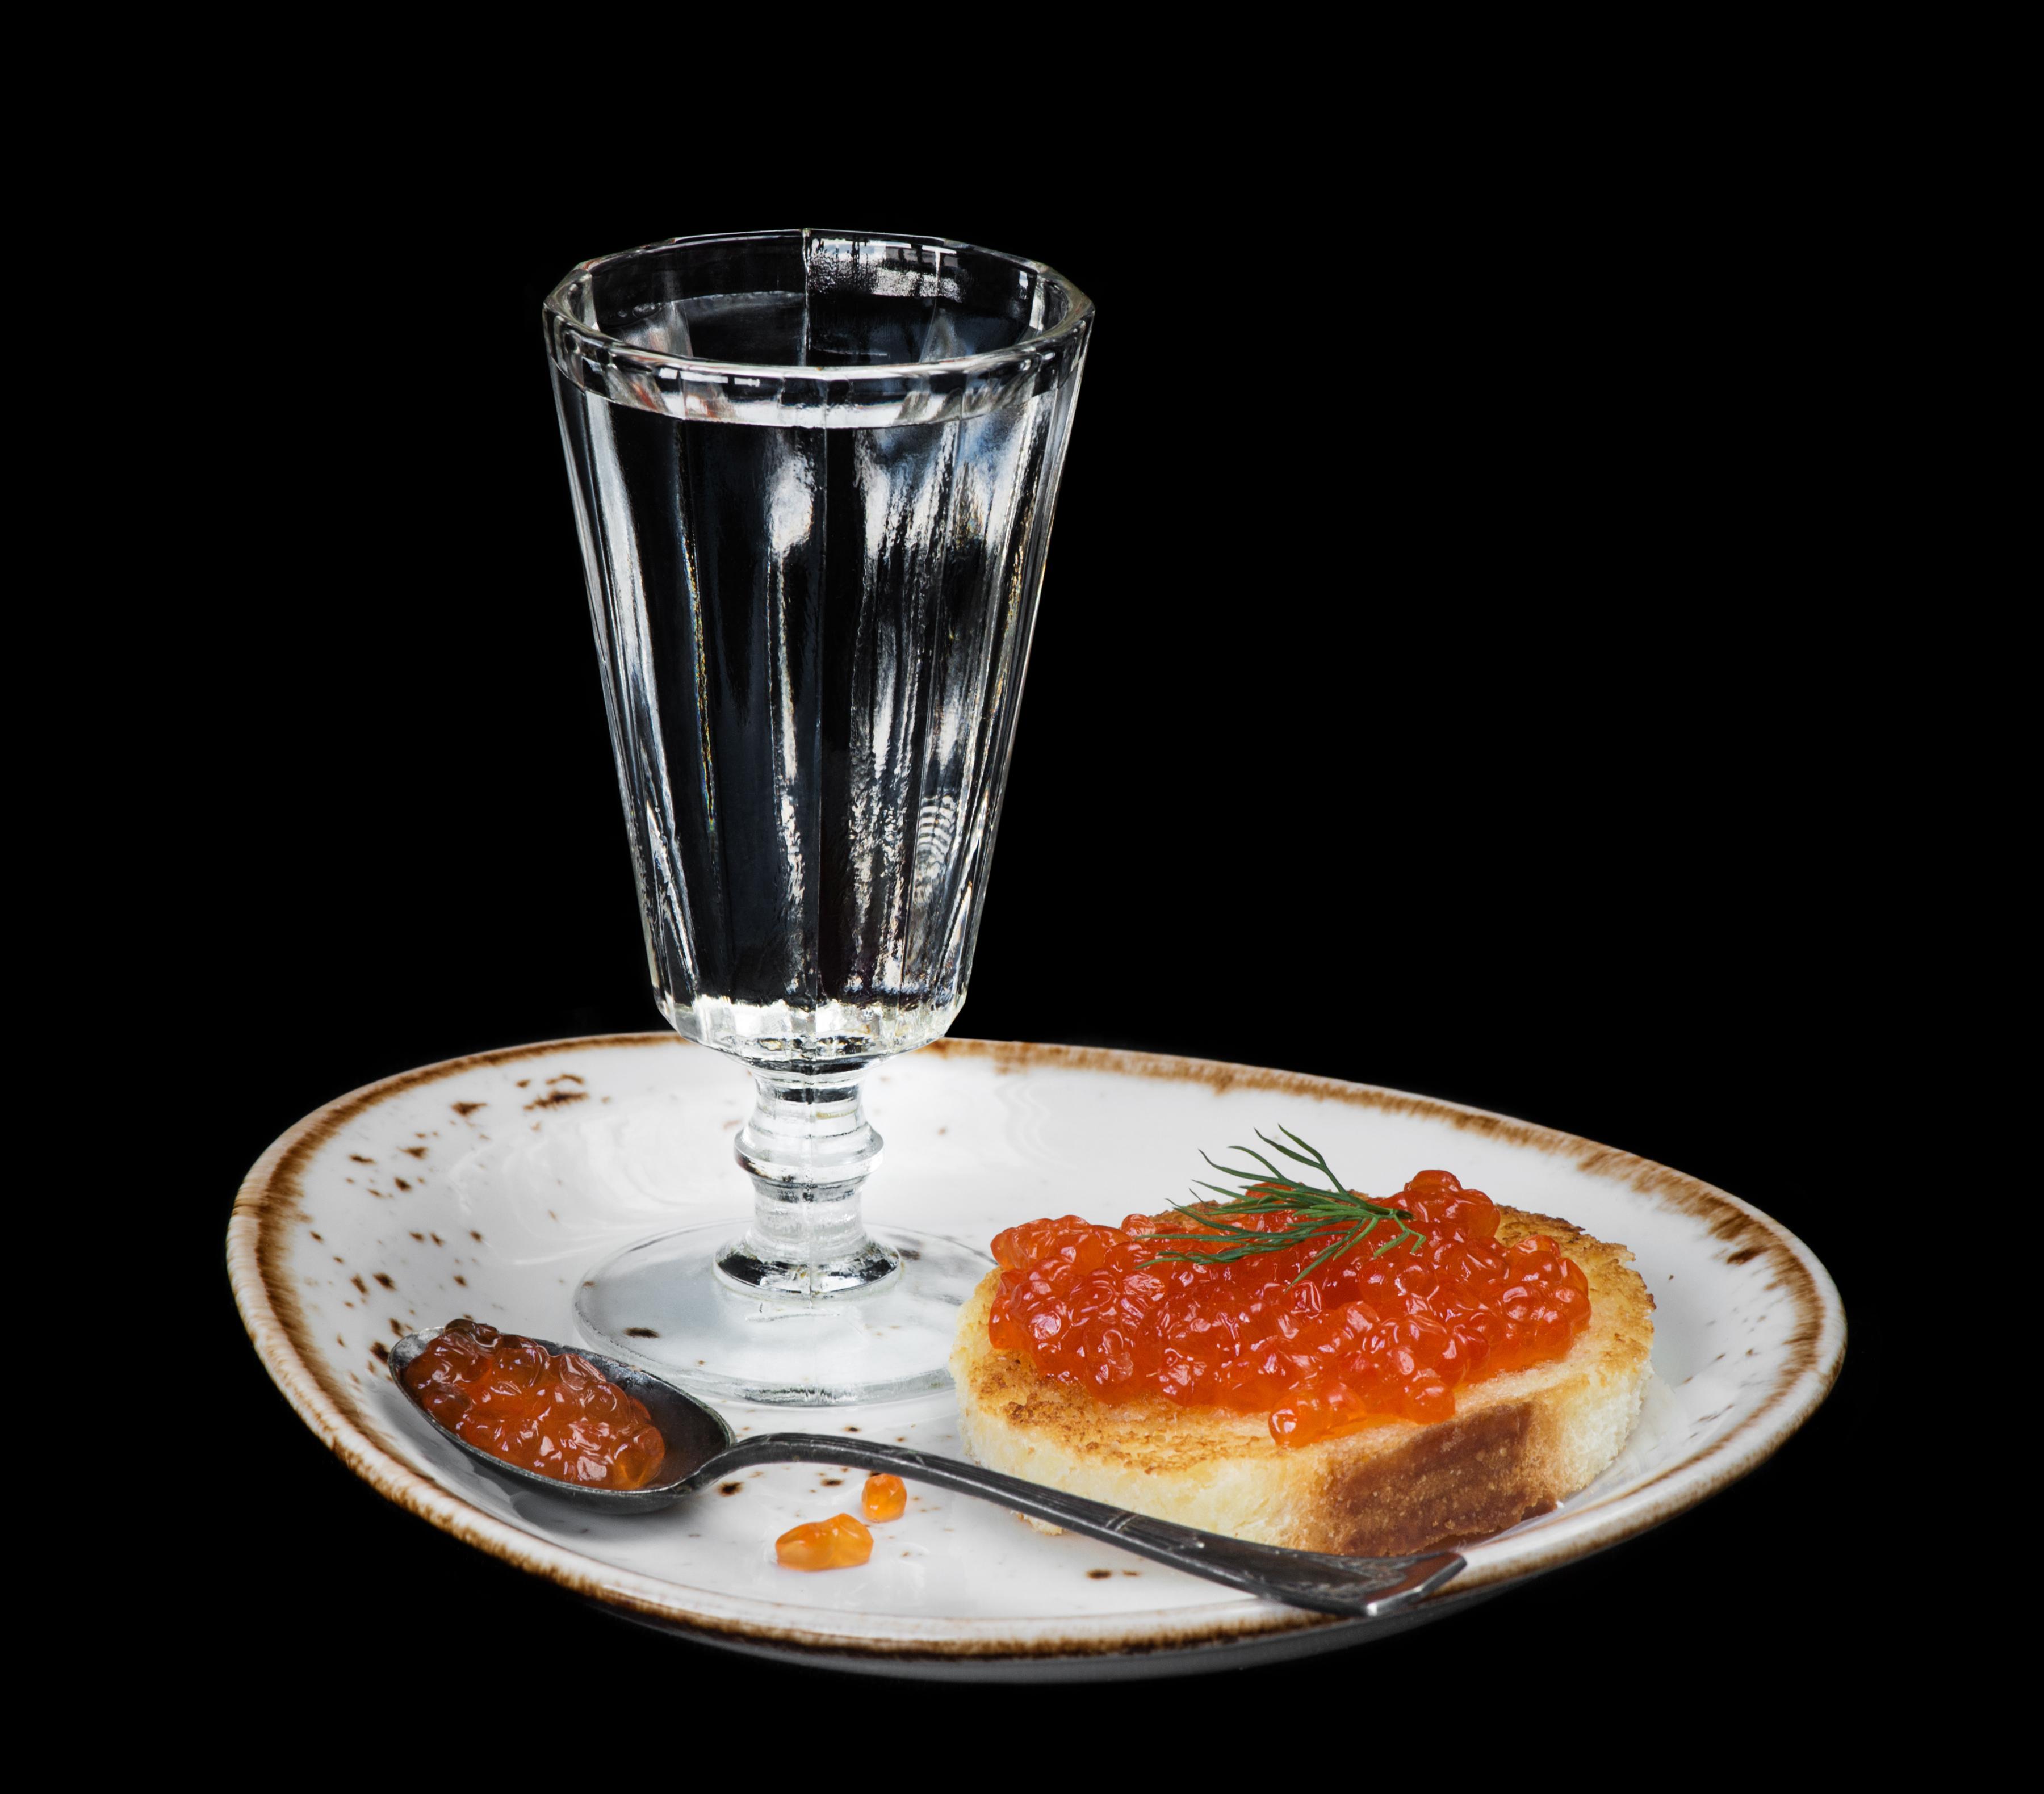 Vodka_Butterbrot_Seafoods_Caviar_Black_background_558317_3600x3160.jpg